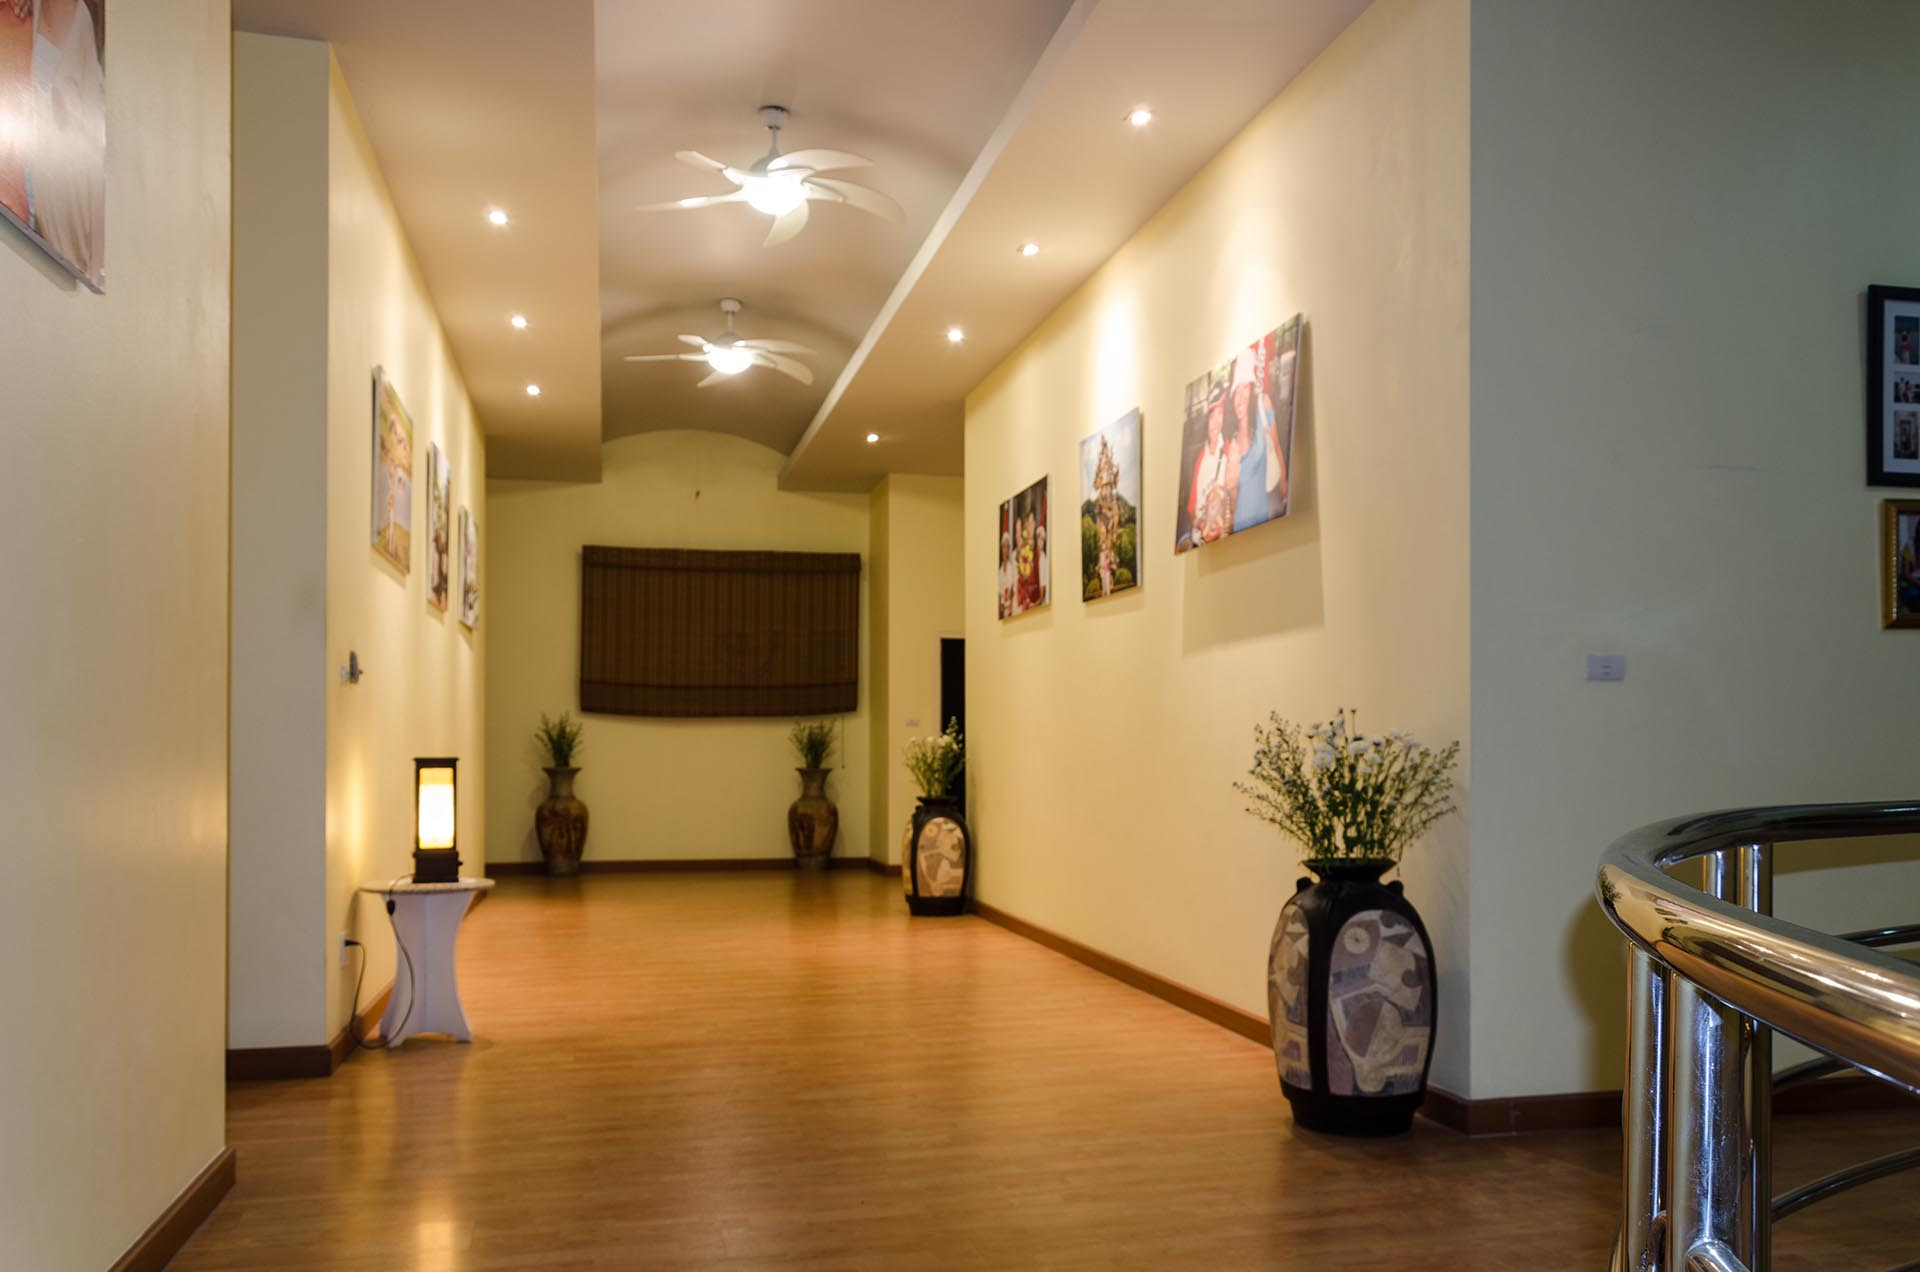 Buriram 2nd floor hallway